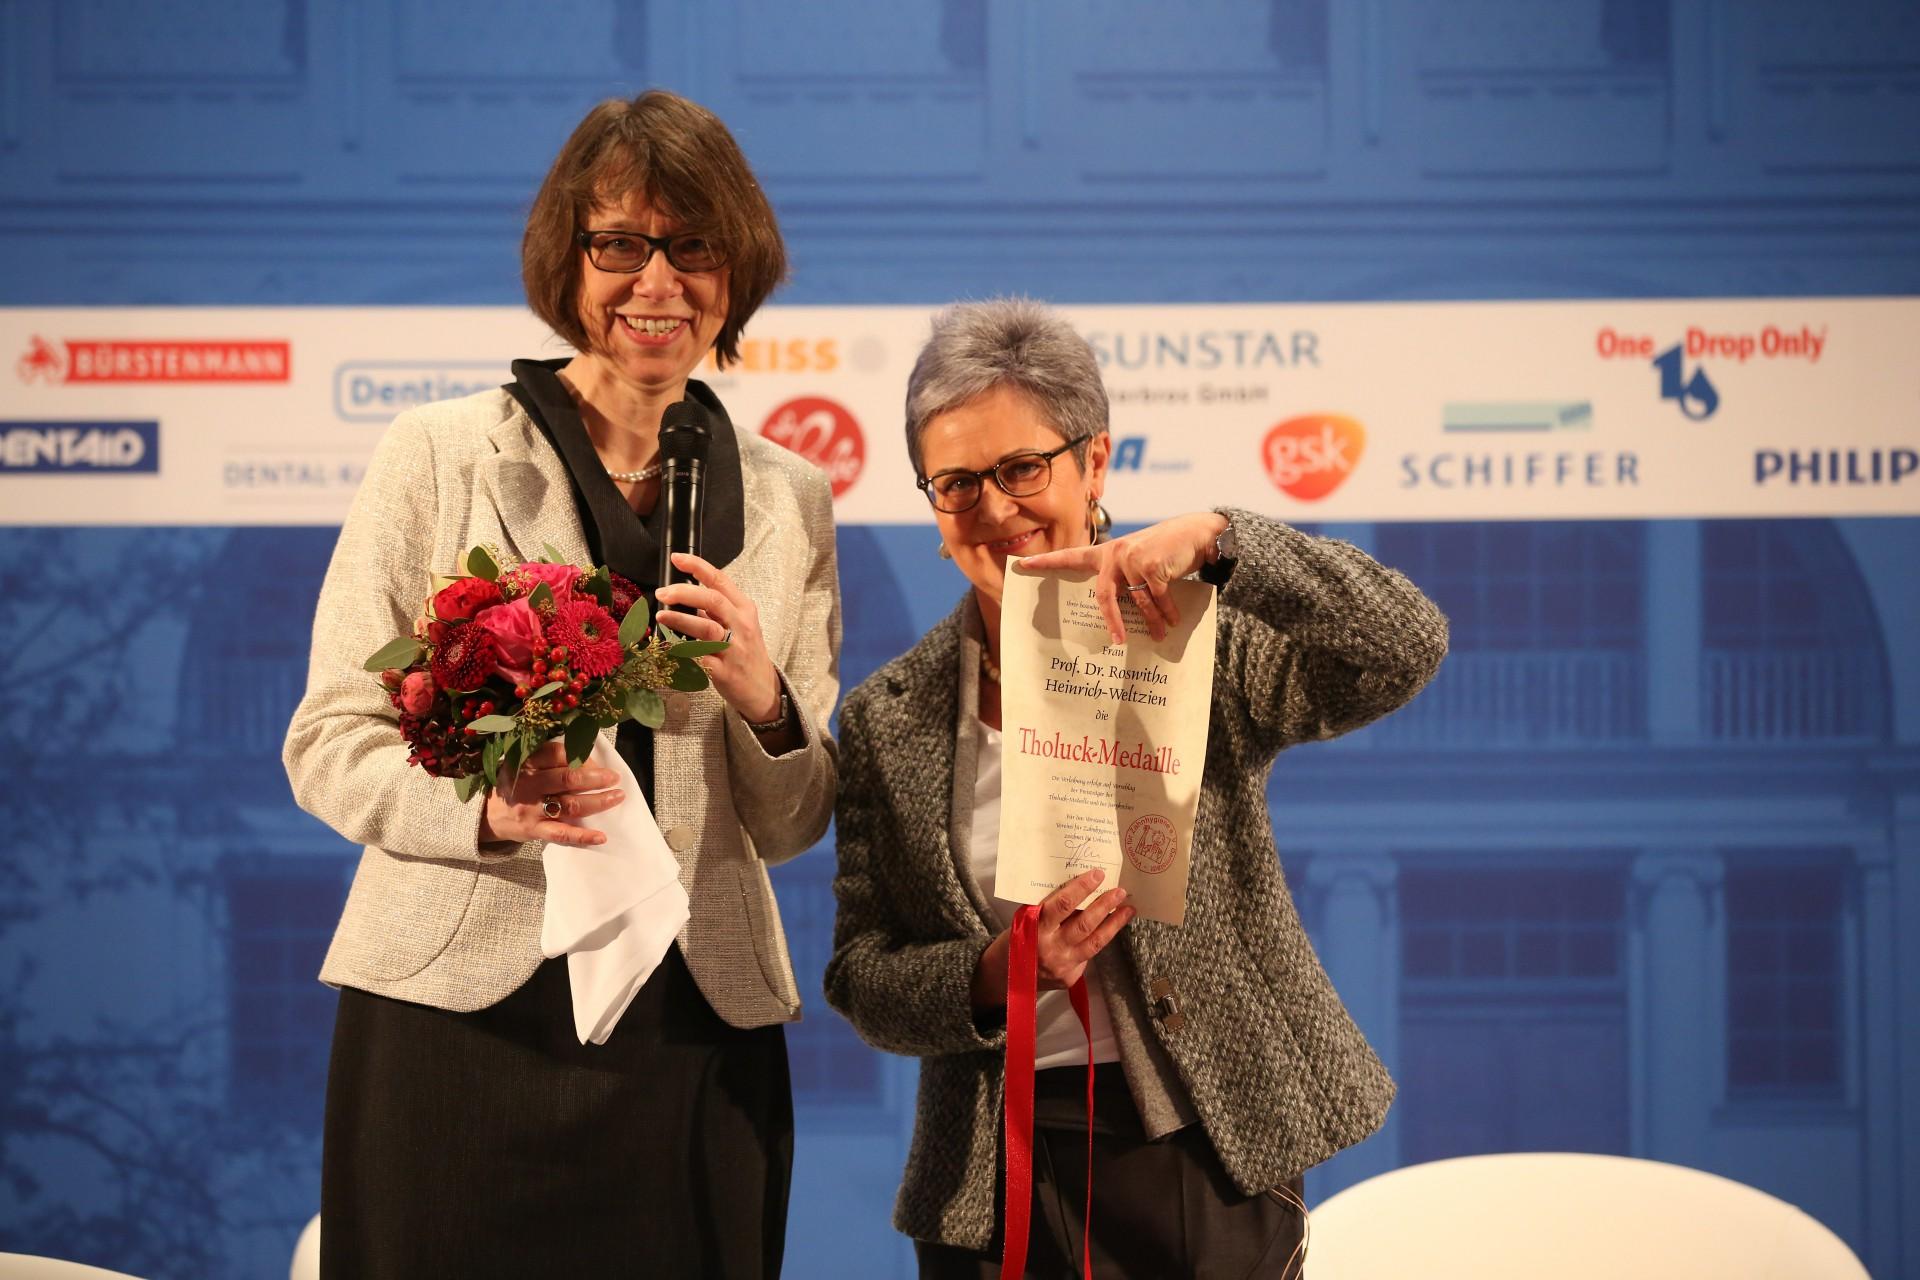 Verleihung der Tholuck-Medaille an Prof. Dr. Roswitha Heinrich-Weltzien durch Dr. Marianne v. Schmettow